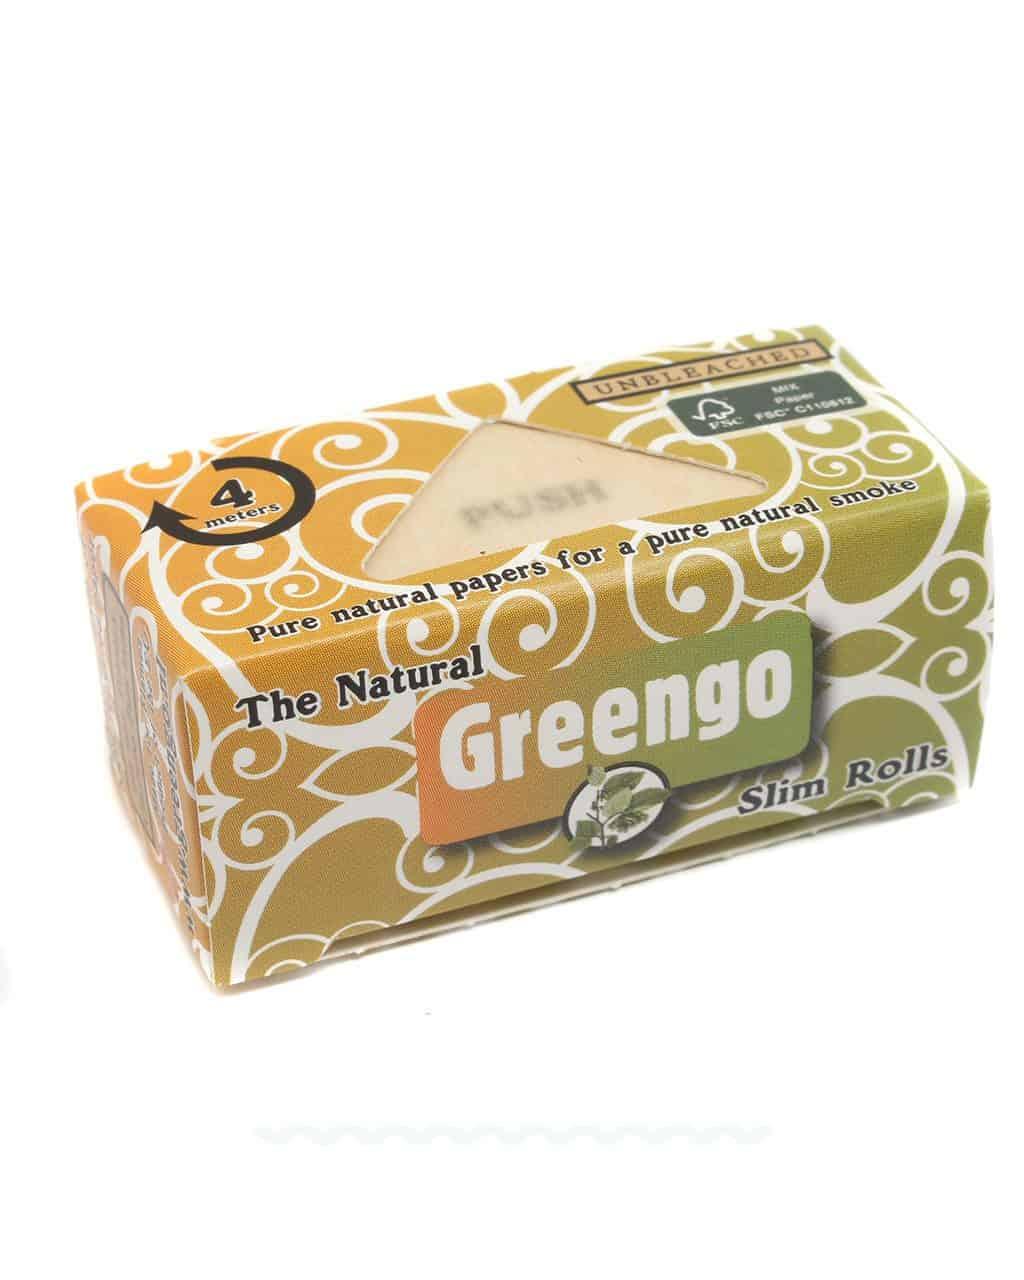 Endlos Papers / Rolls GREENGO Slim Rolls 'The Natural' ungebleicht